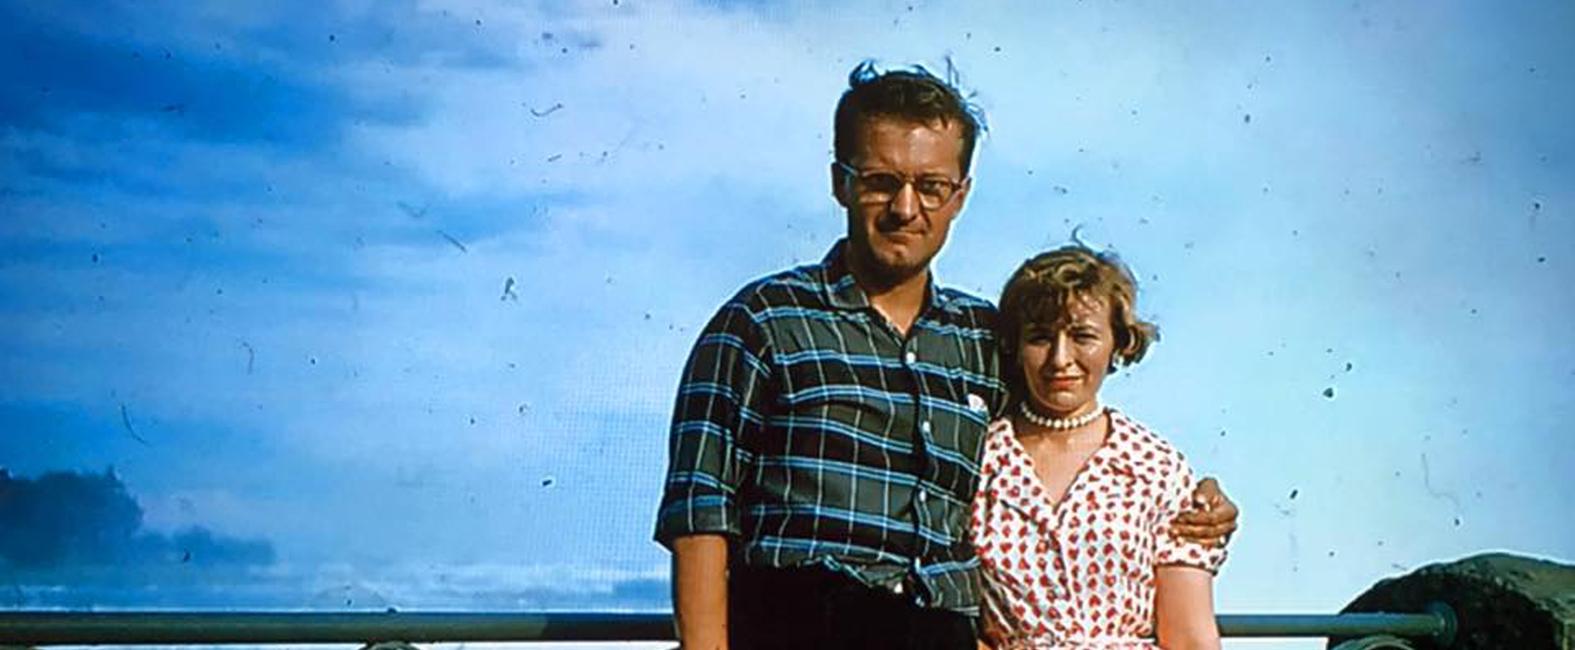 Henry Leonard Kaminski: Rest in Peace, Rise in Glory